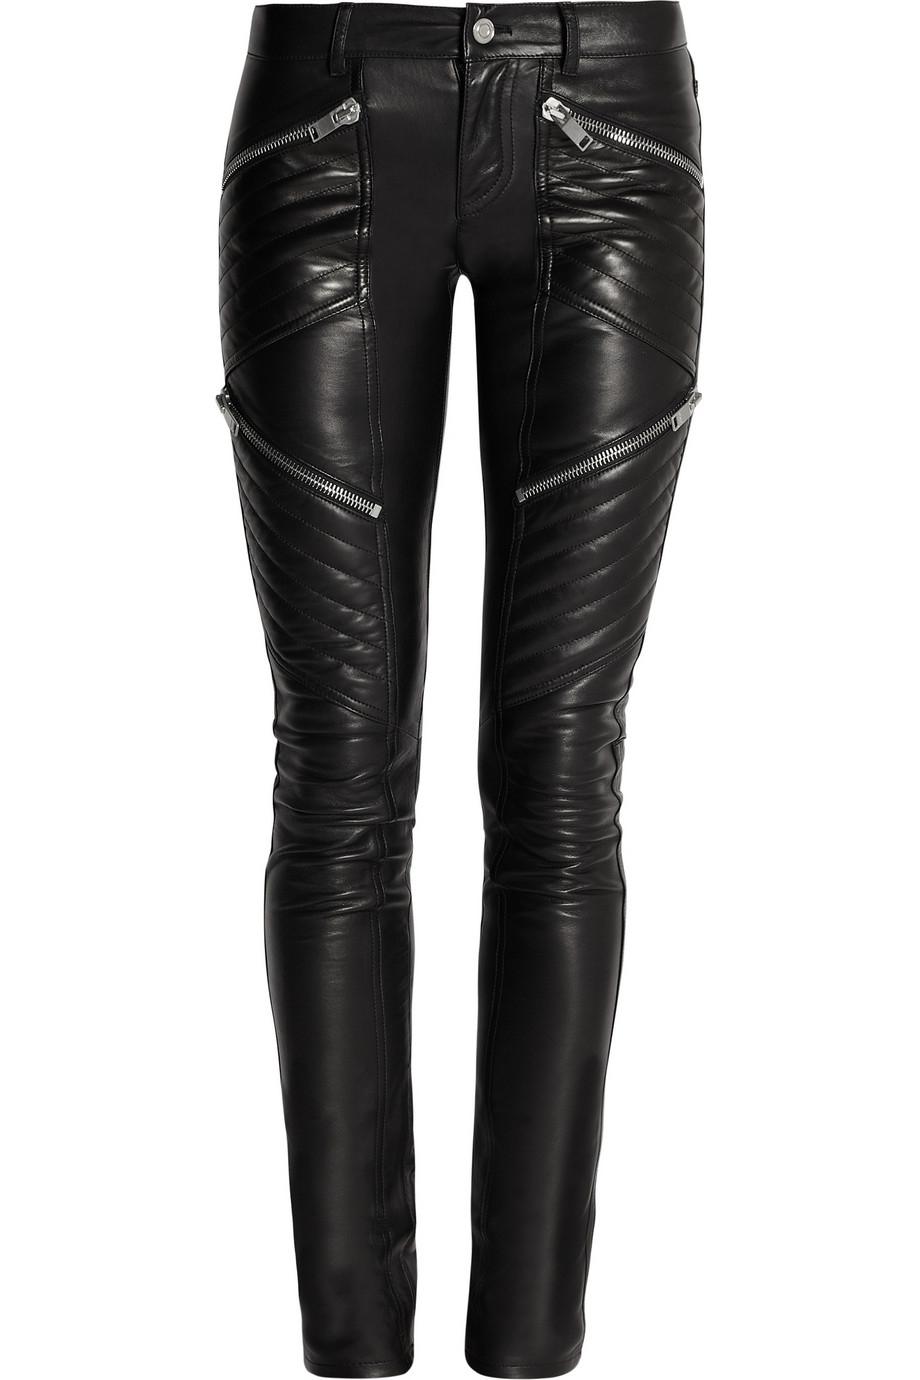 Saint Laurent Leather Skinny Pants In Black Lyst